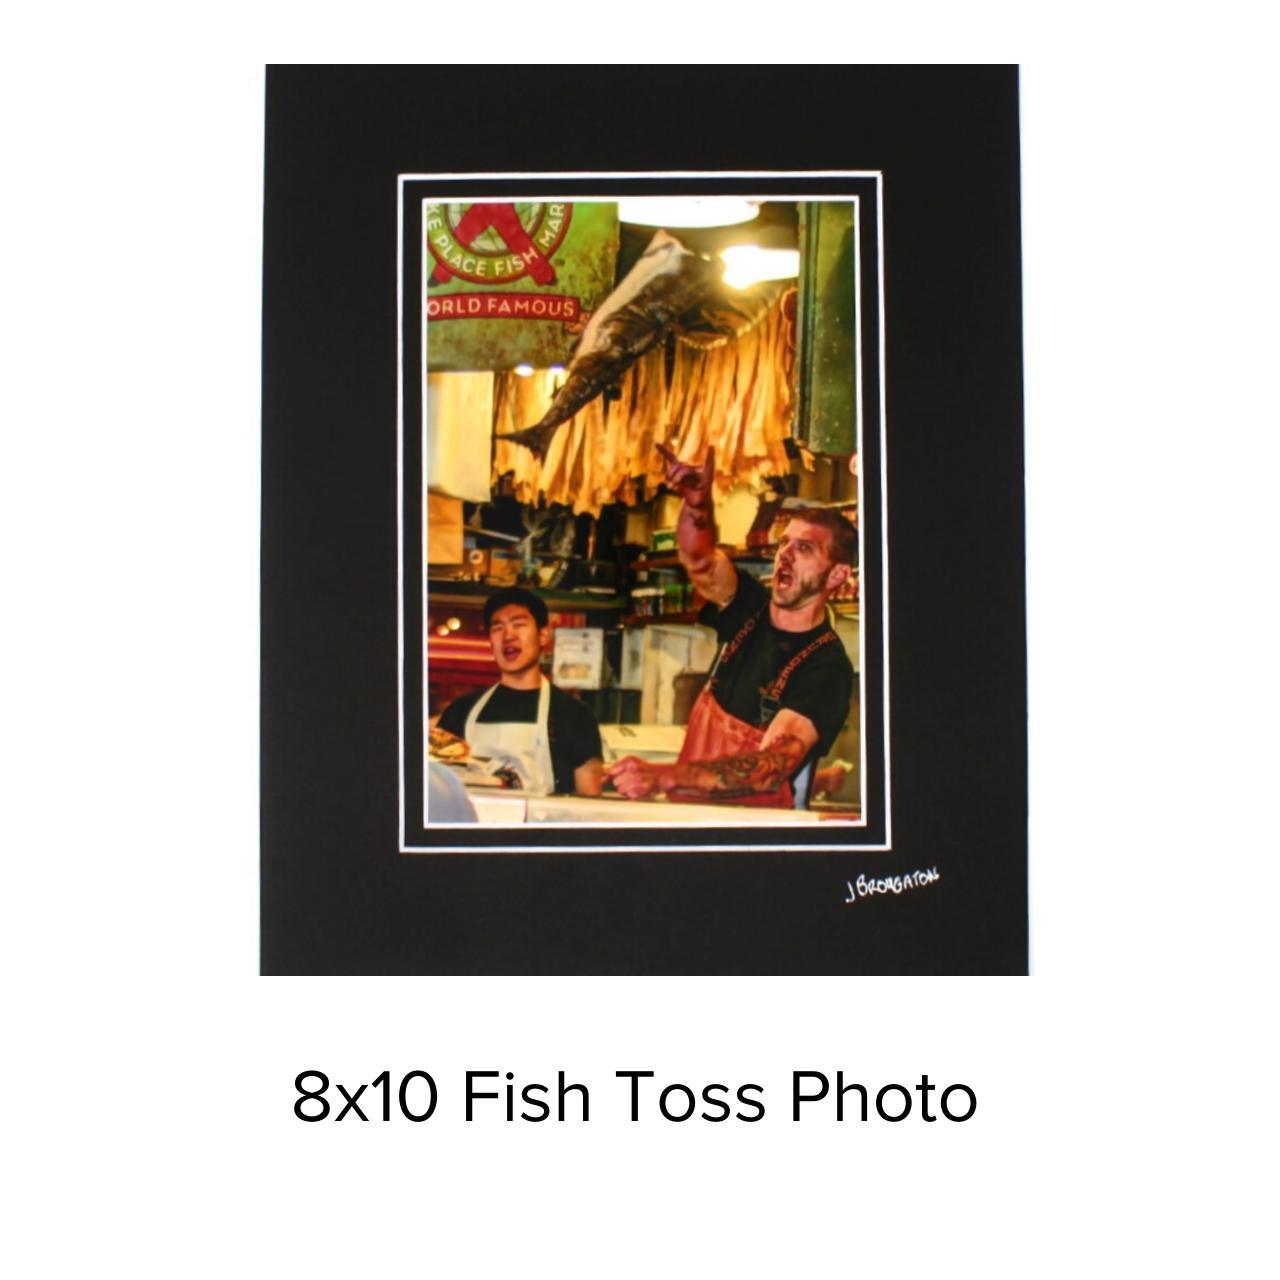 John Broughton Photo 8x10 Fish Toss